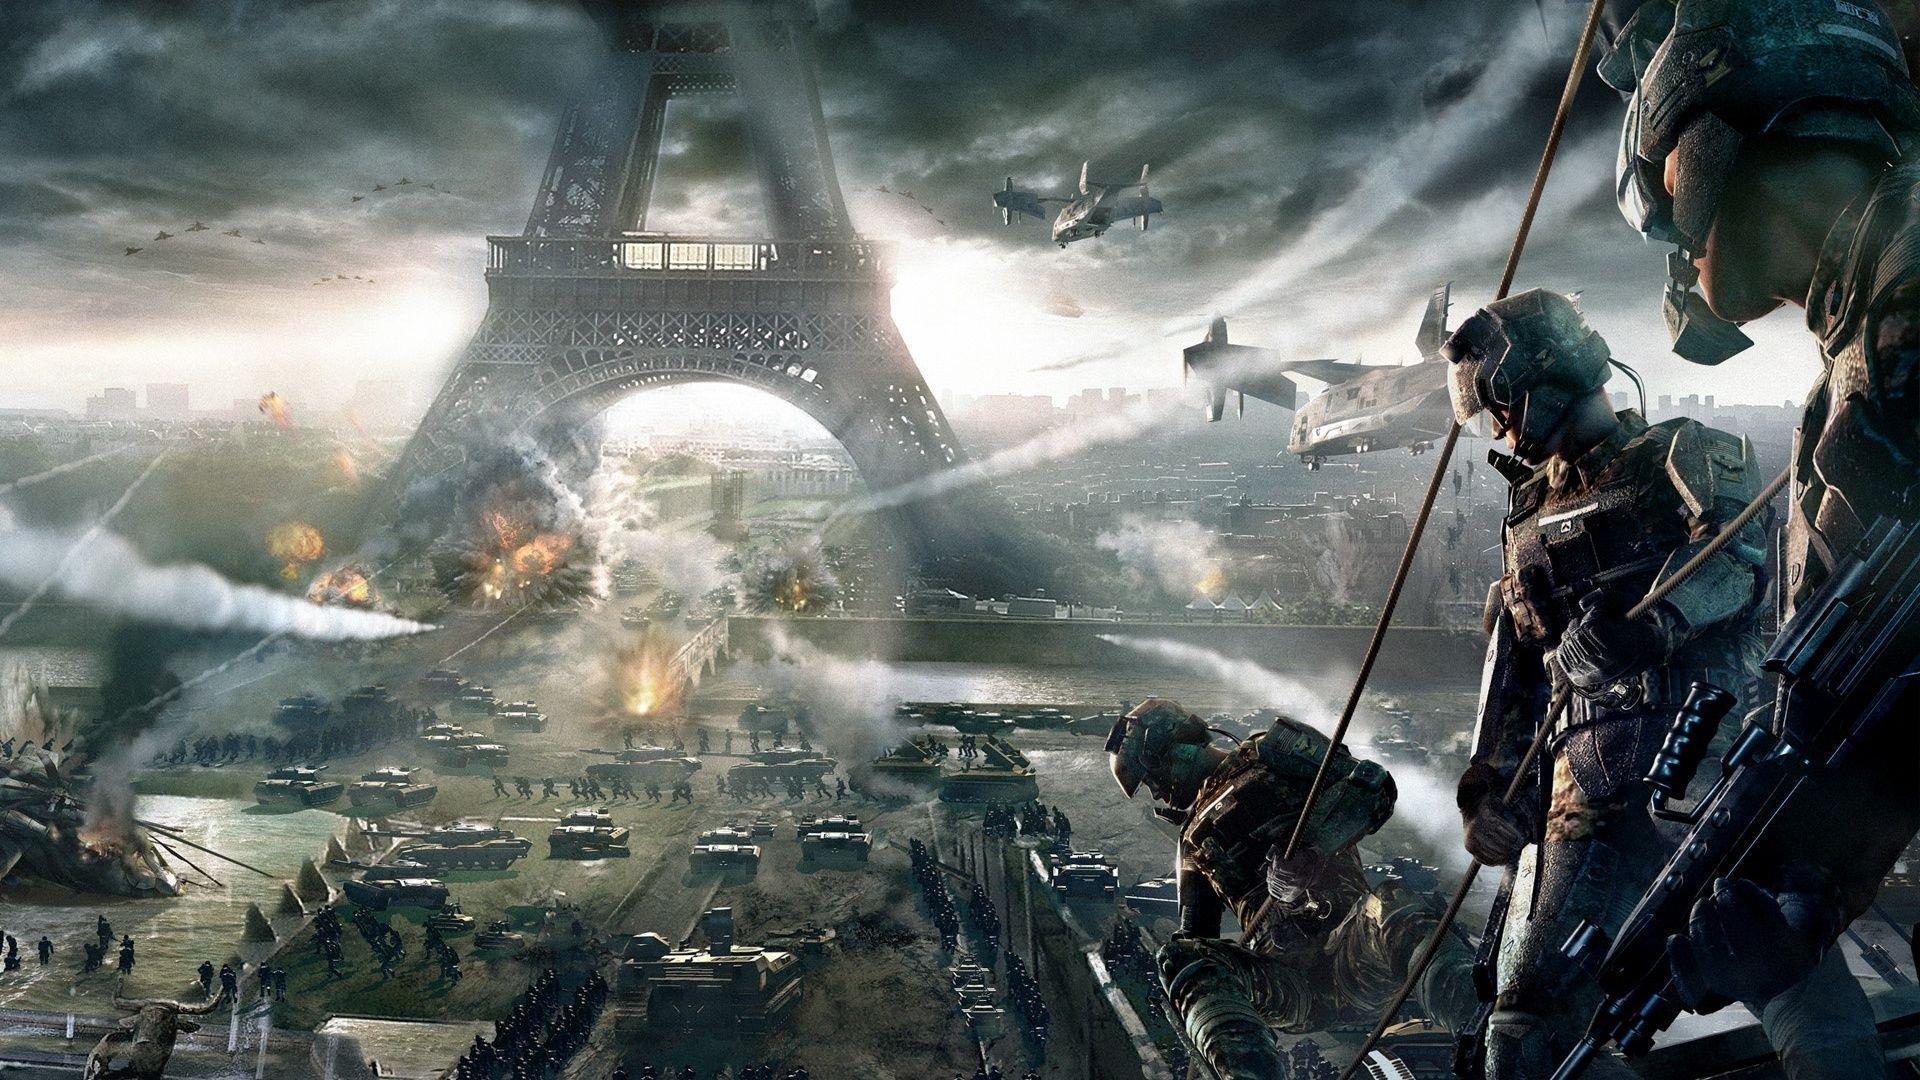 Call Of Duty Modern Warfare 3 Wallpaper 1